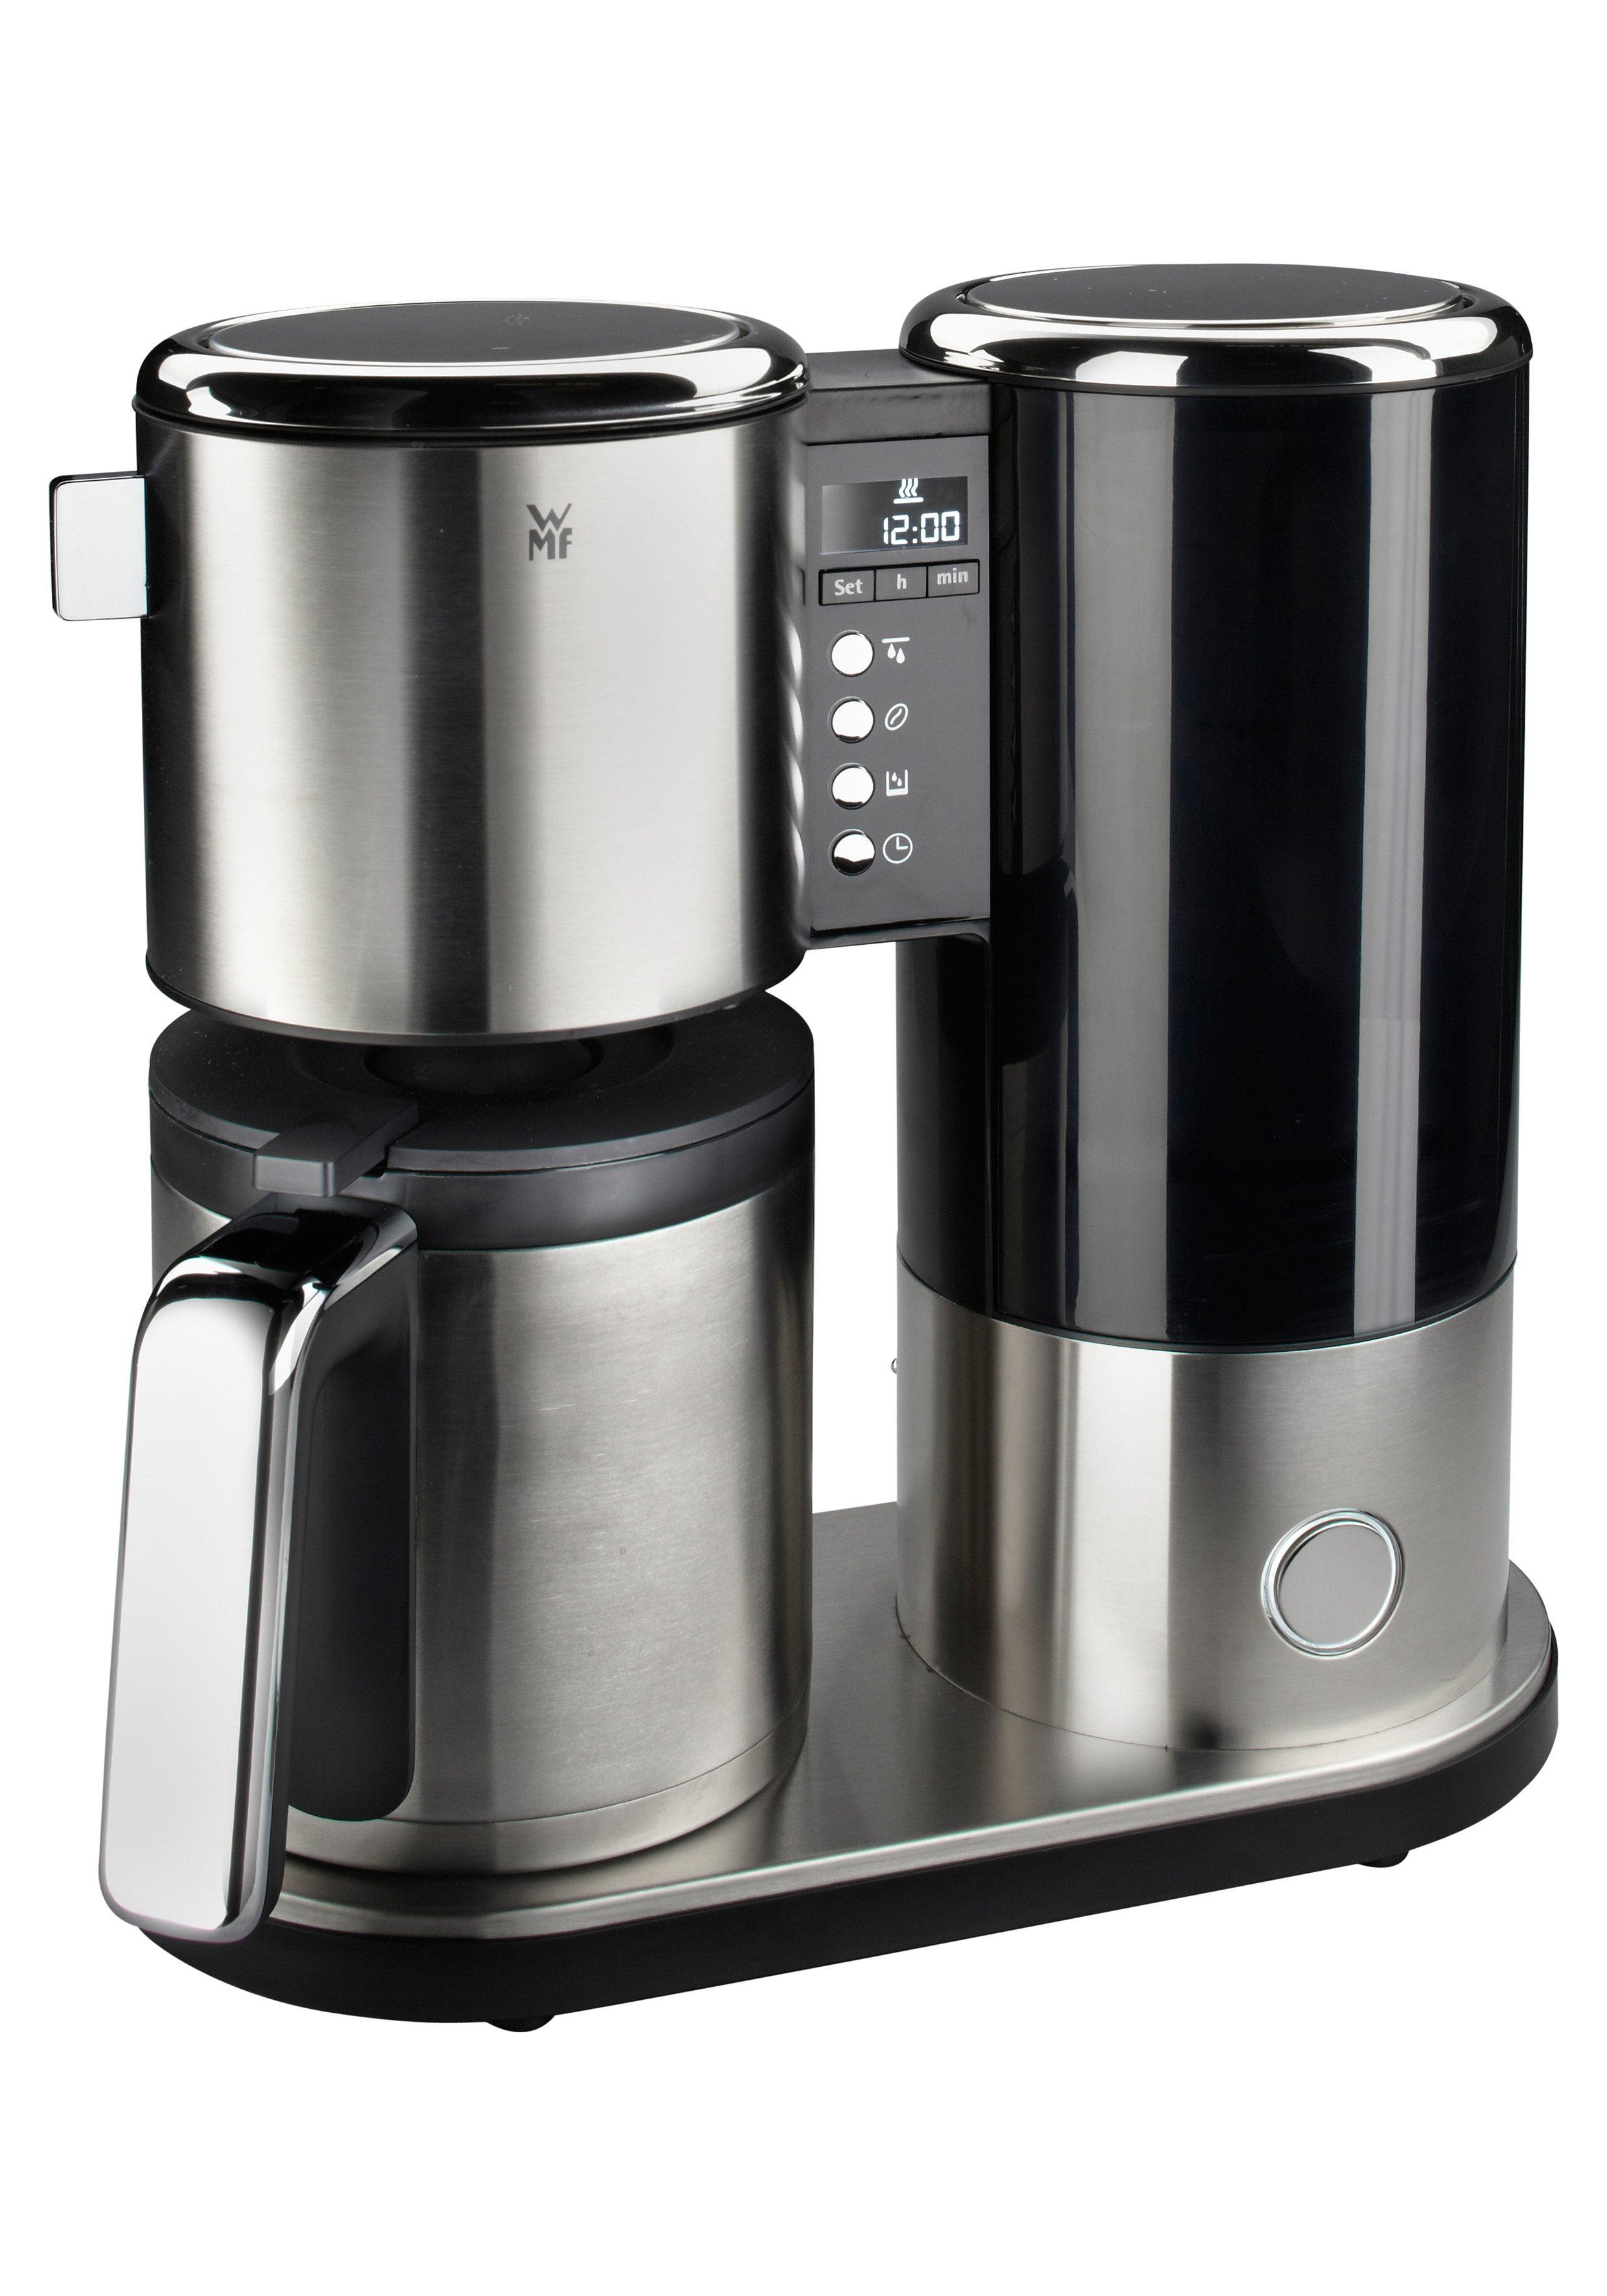 WMF Filterkaffeemaschine Lineo, 1,25l Kaffeekanne, Papierfilter, mit Thermokanne